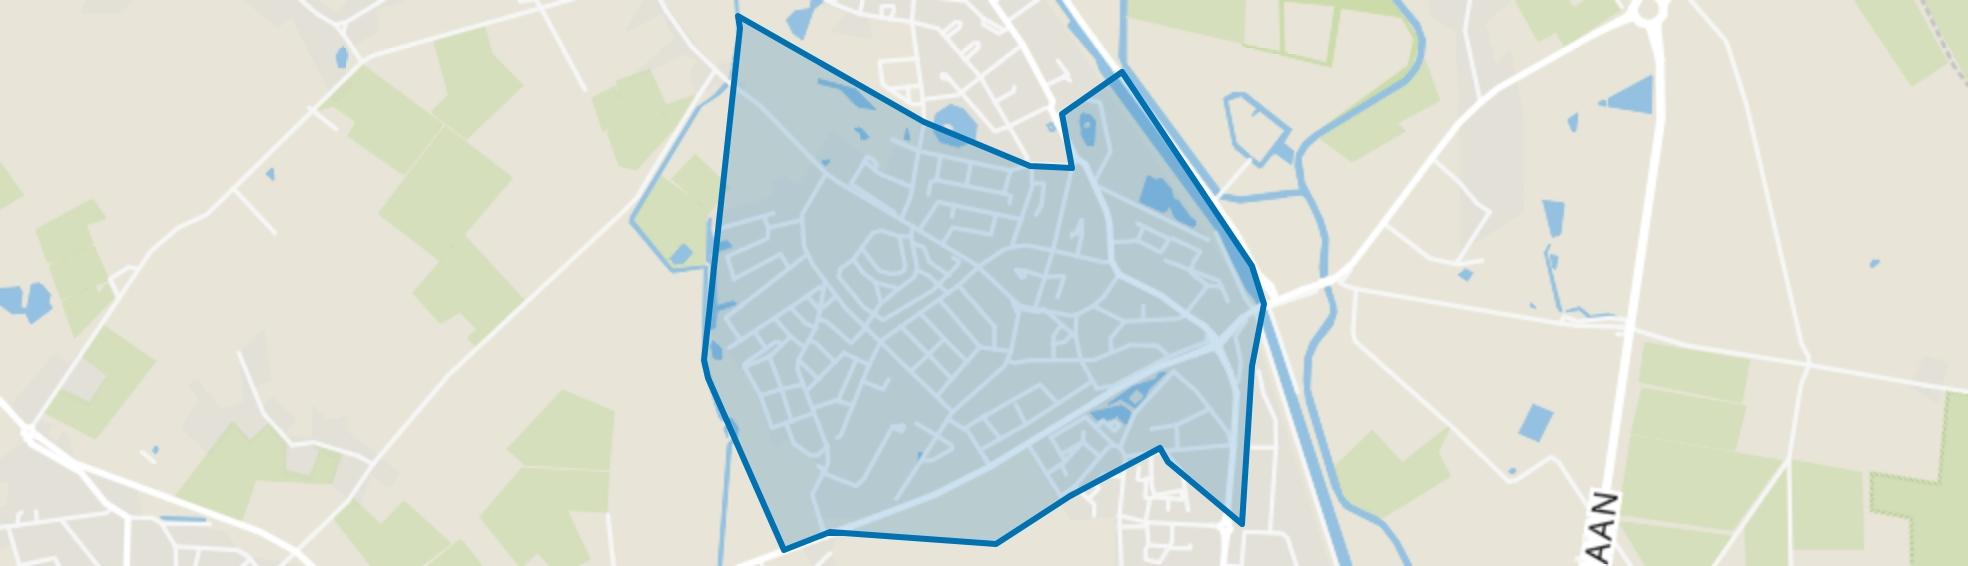 Beek, Beek en Donk map